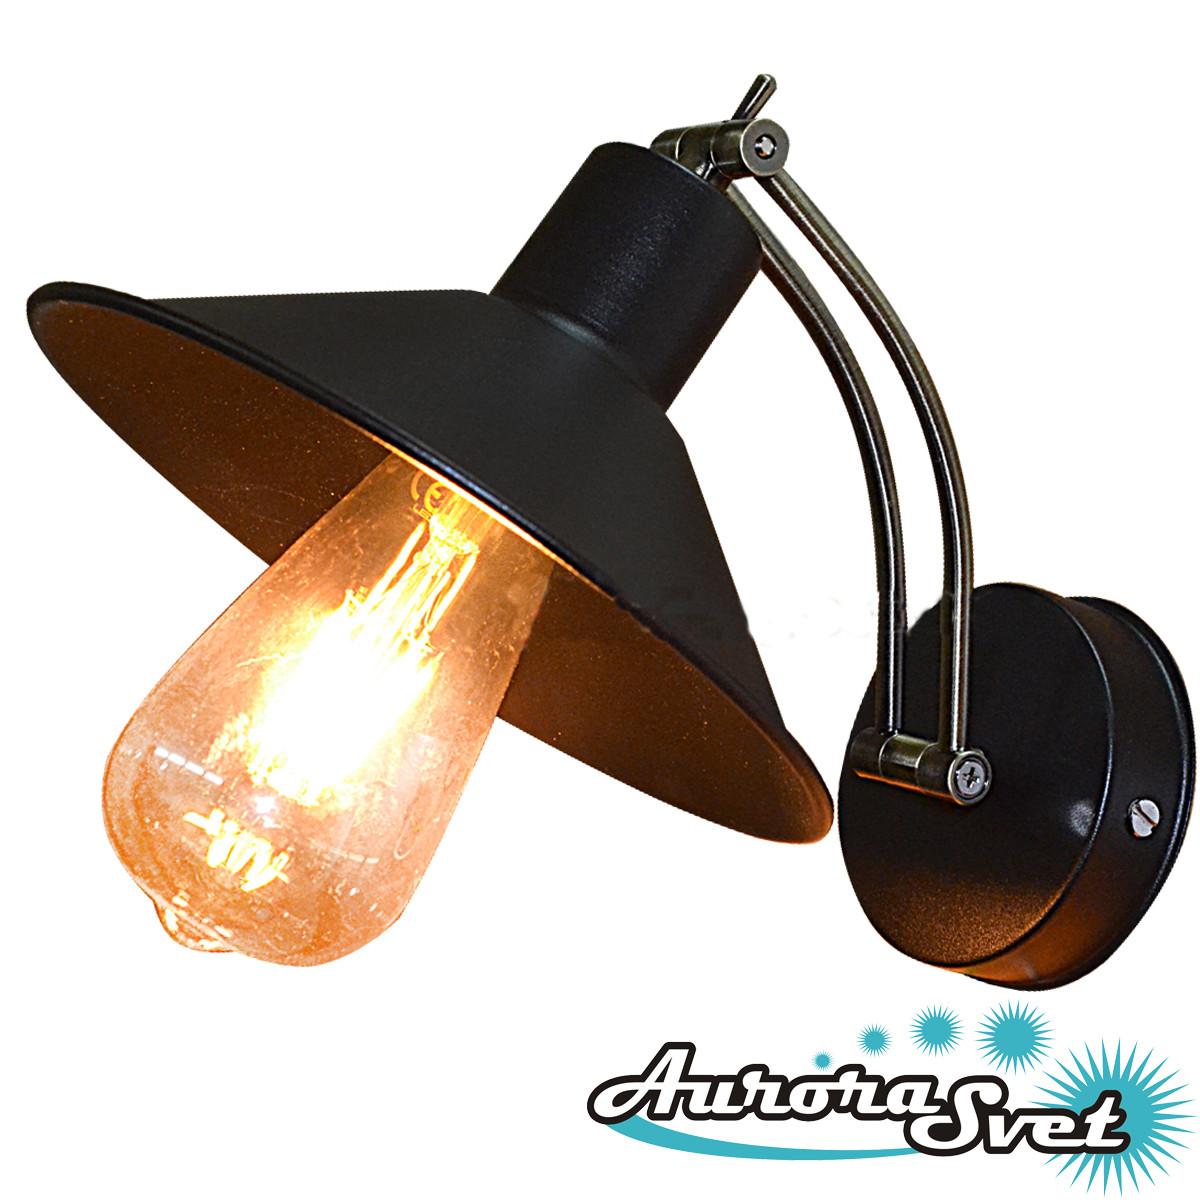 Бра настенная AuroraSvet loft 9800 чёрная.LED светильник бра. Светодиодный светильник бра.